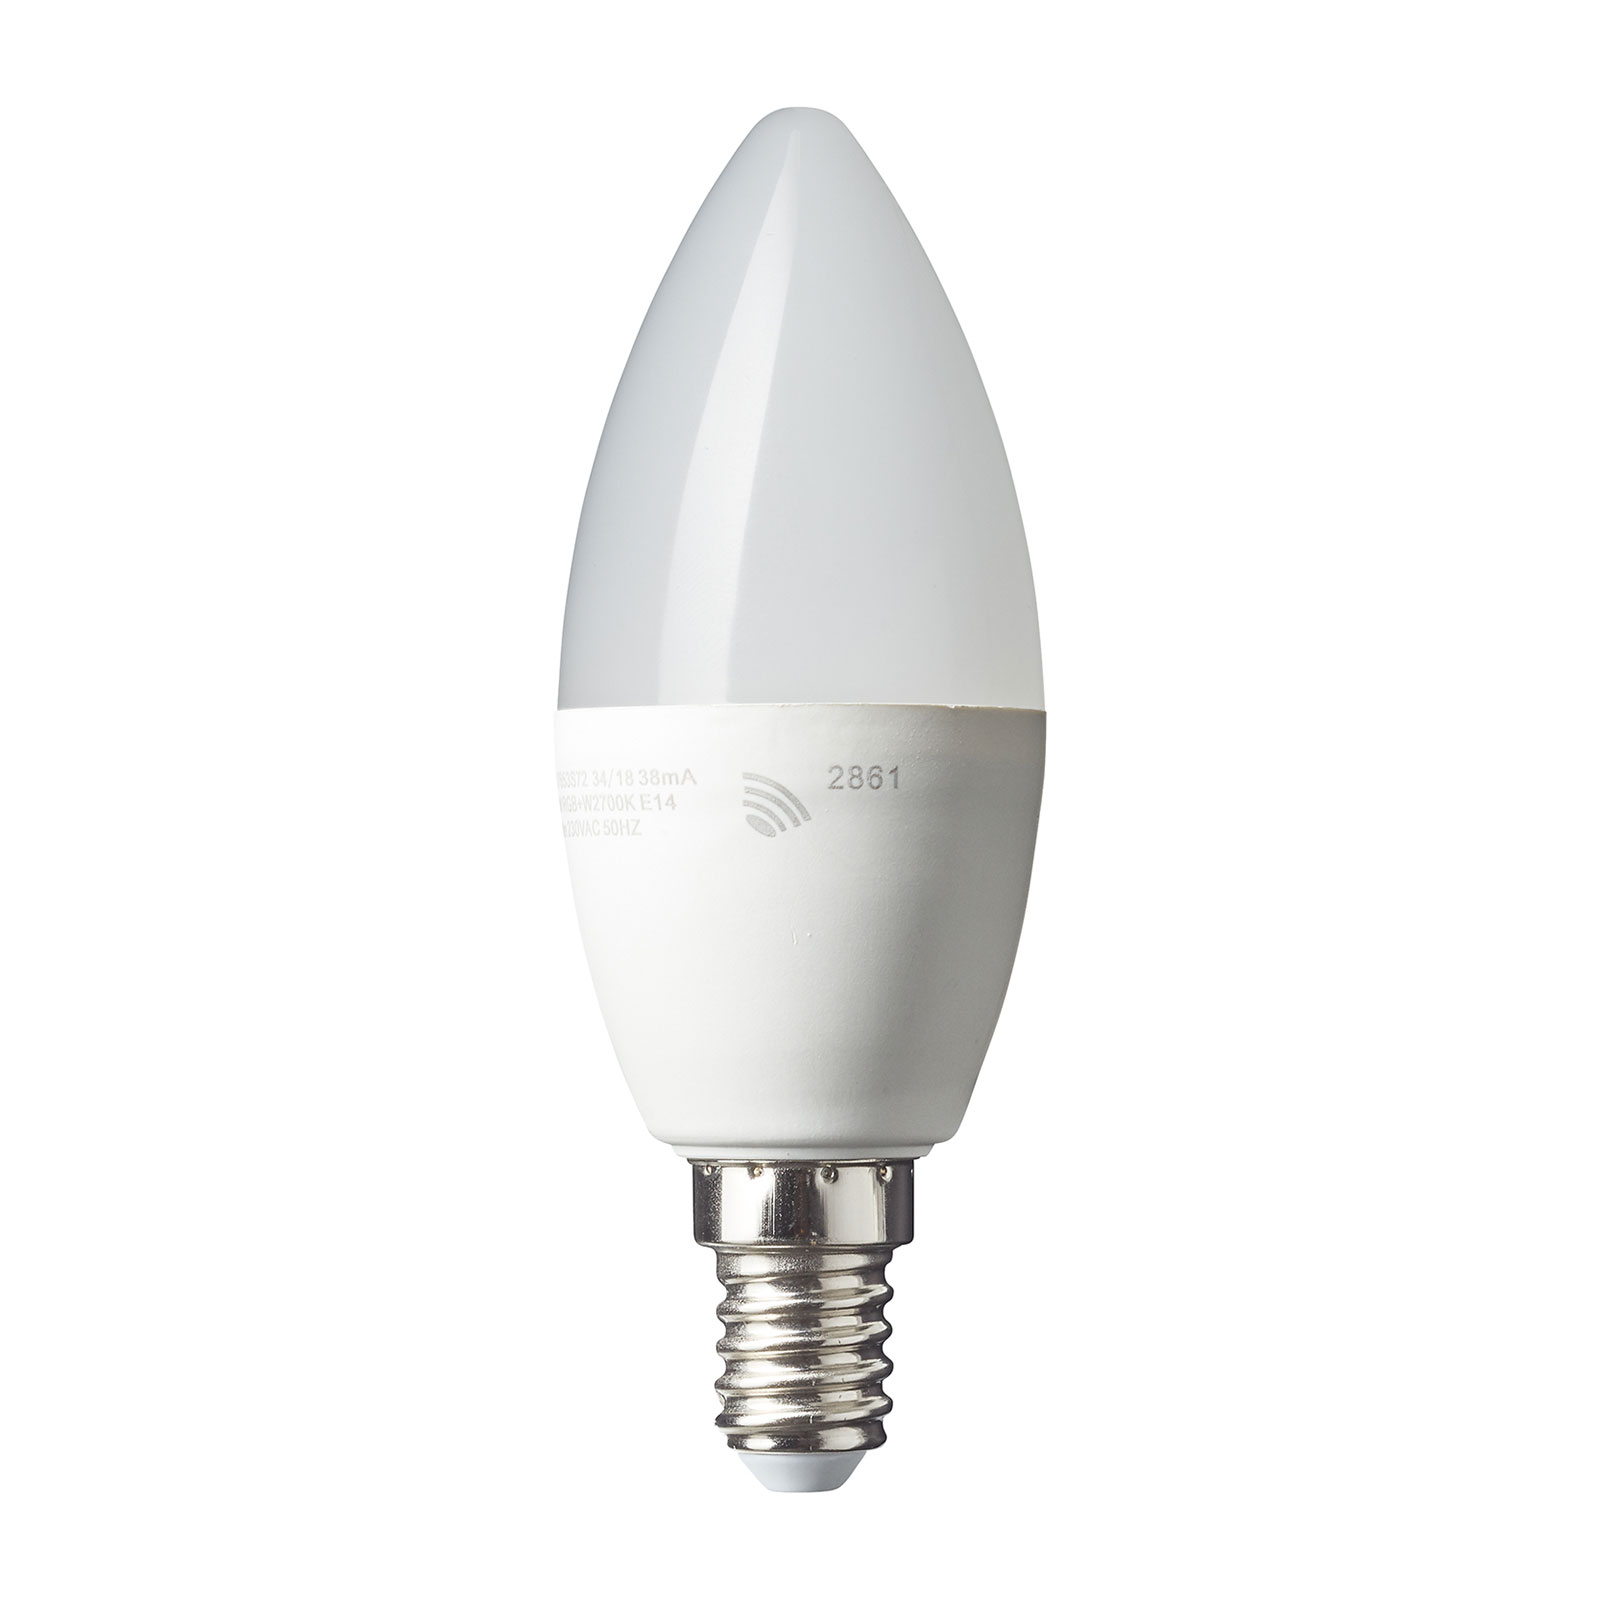 Ampoule flamme LED E14 4,5W Smart-Tuya RGBW